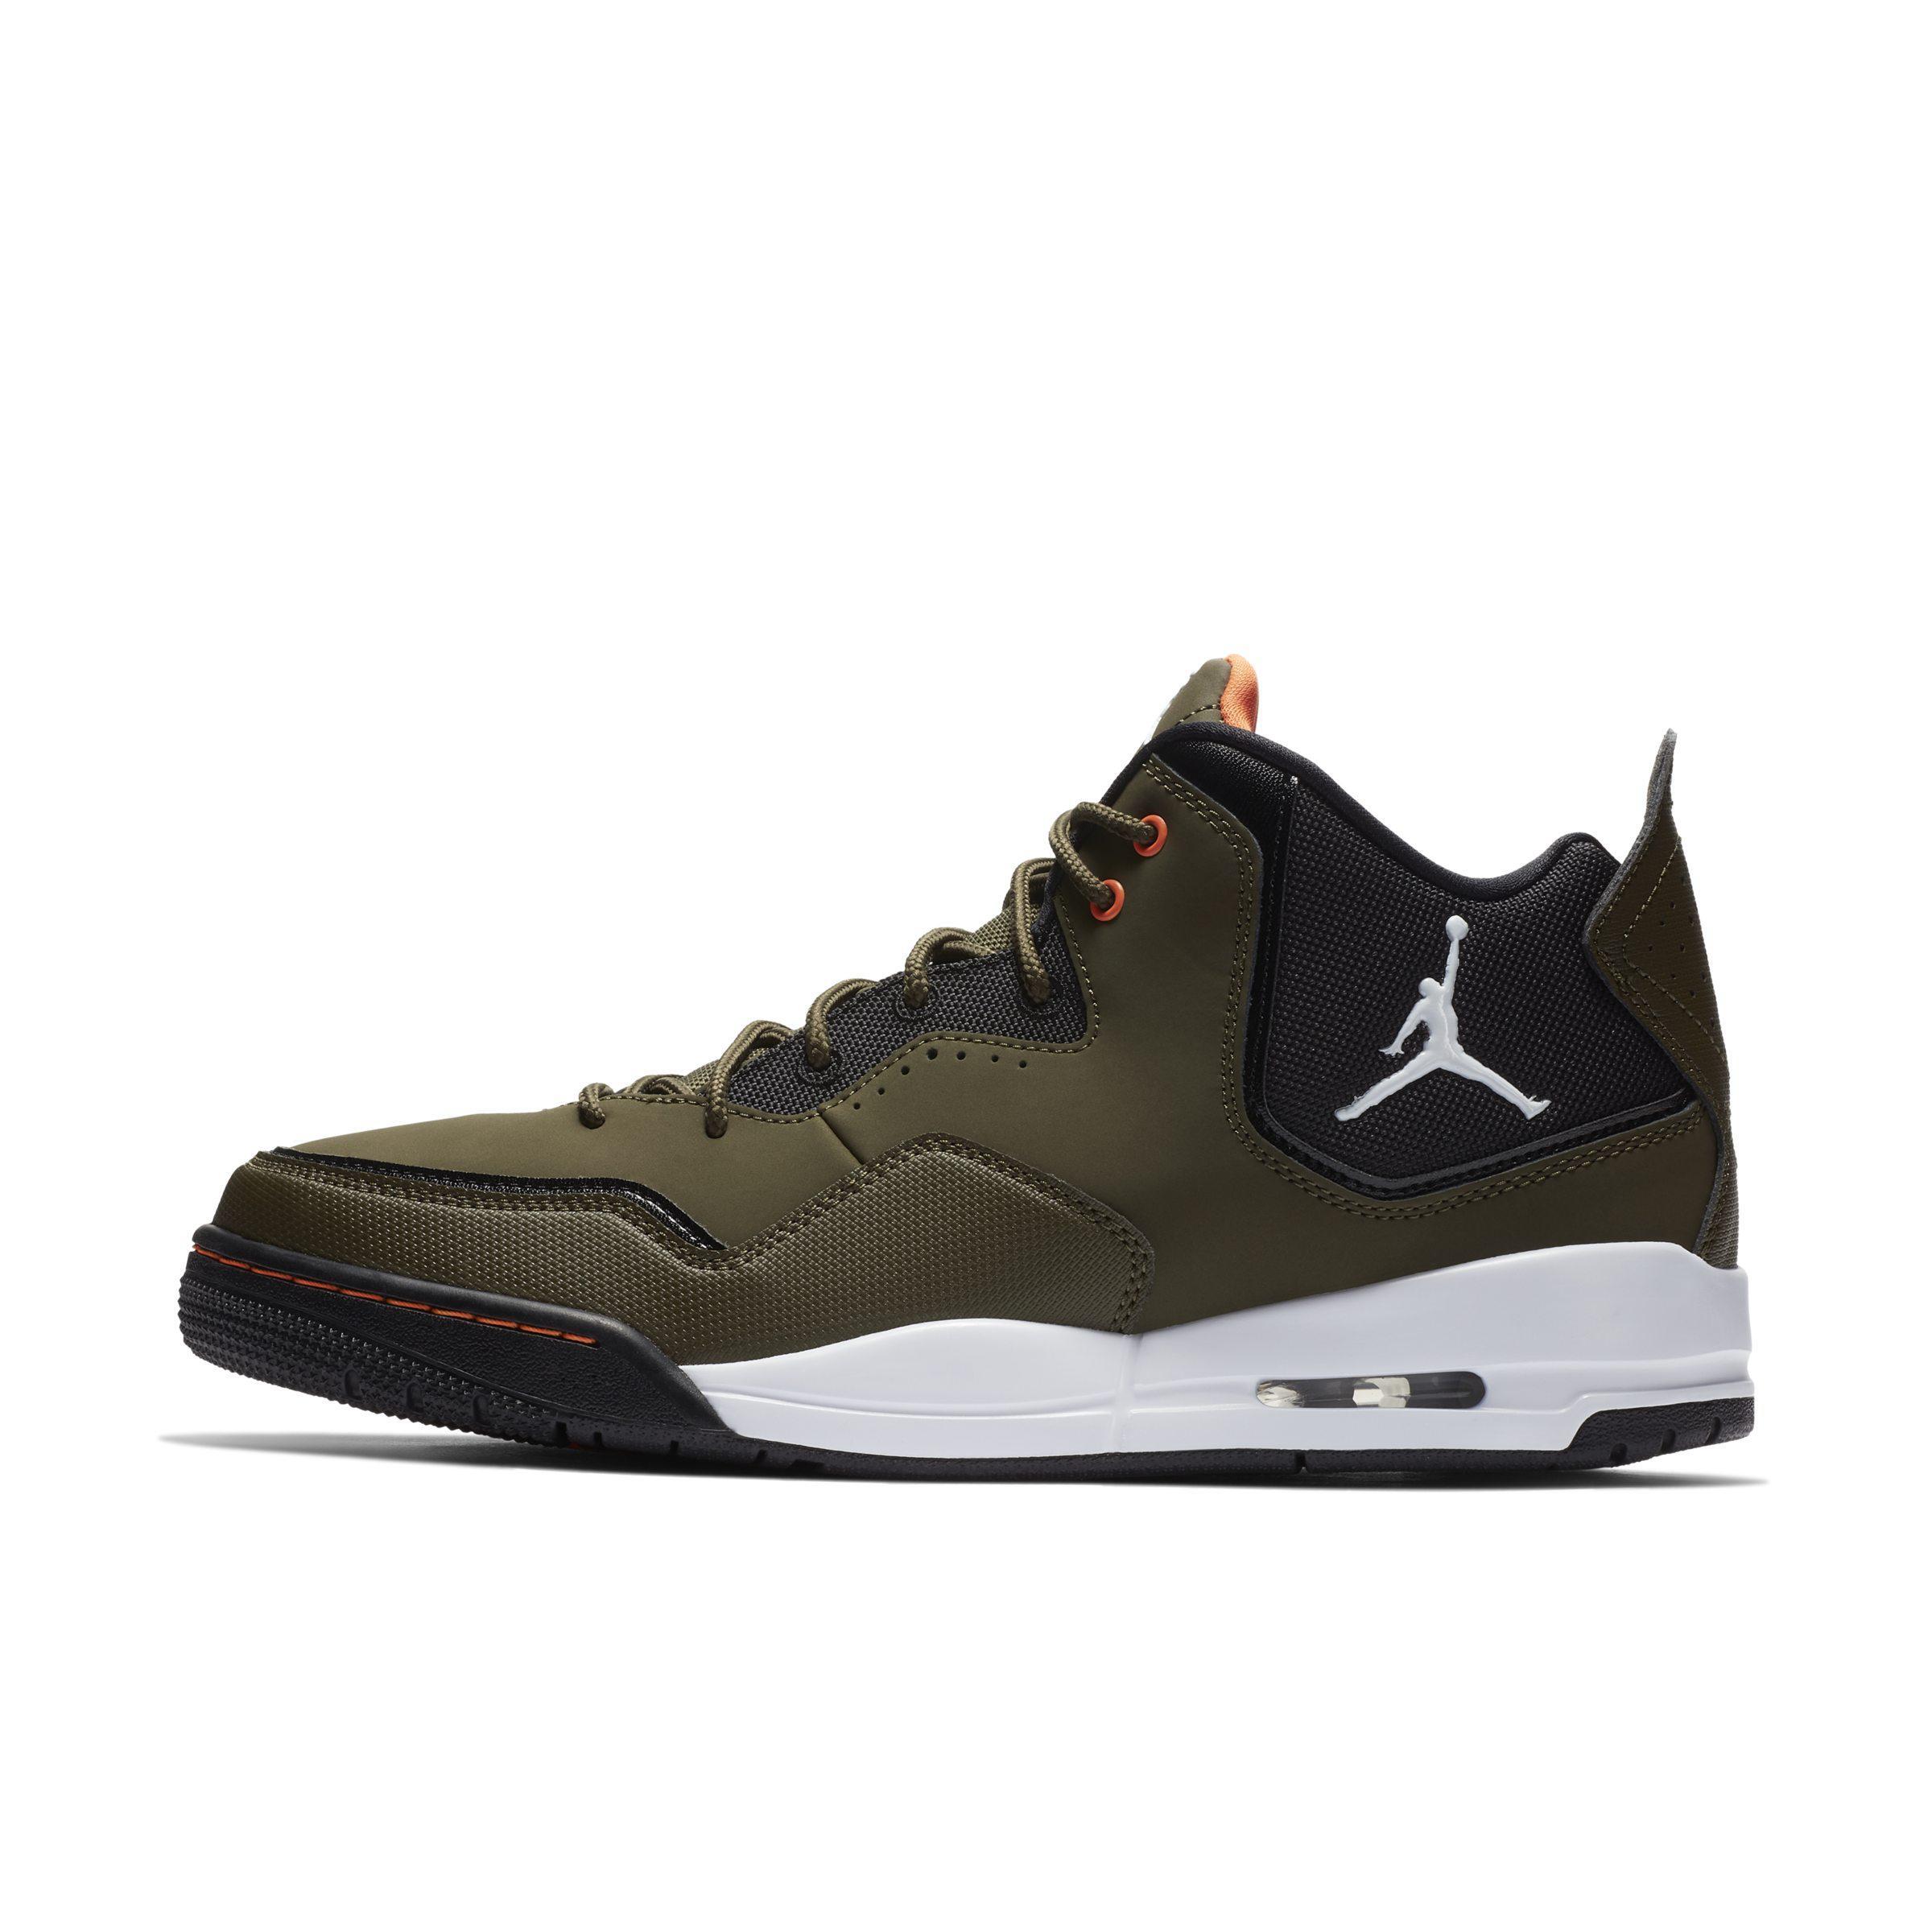 sports shoes a87d3 e3a25 Nike Jordan Courtside 23 Shoe in Green for Men - Lyst